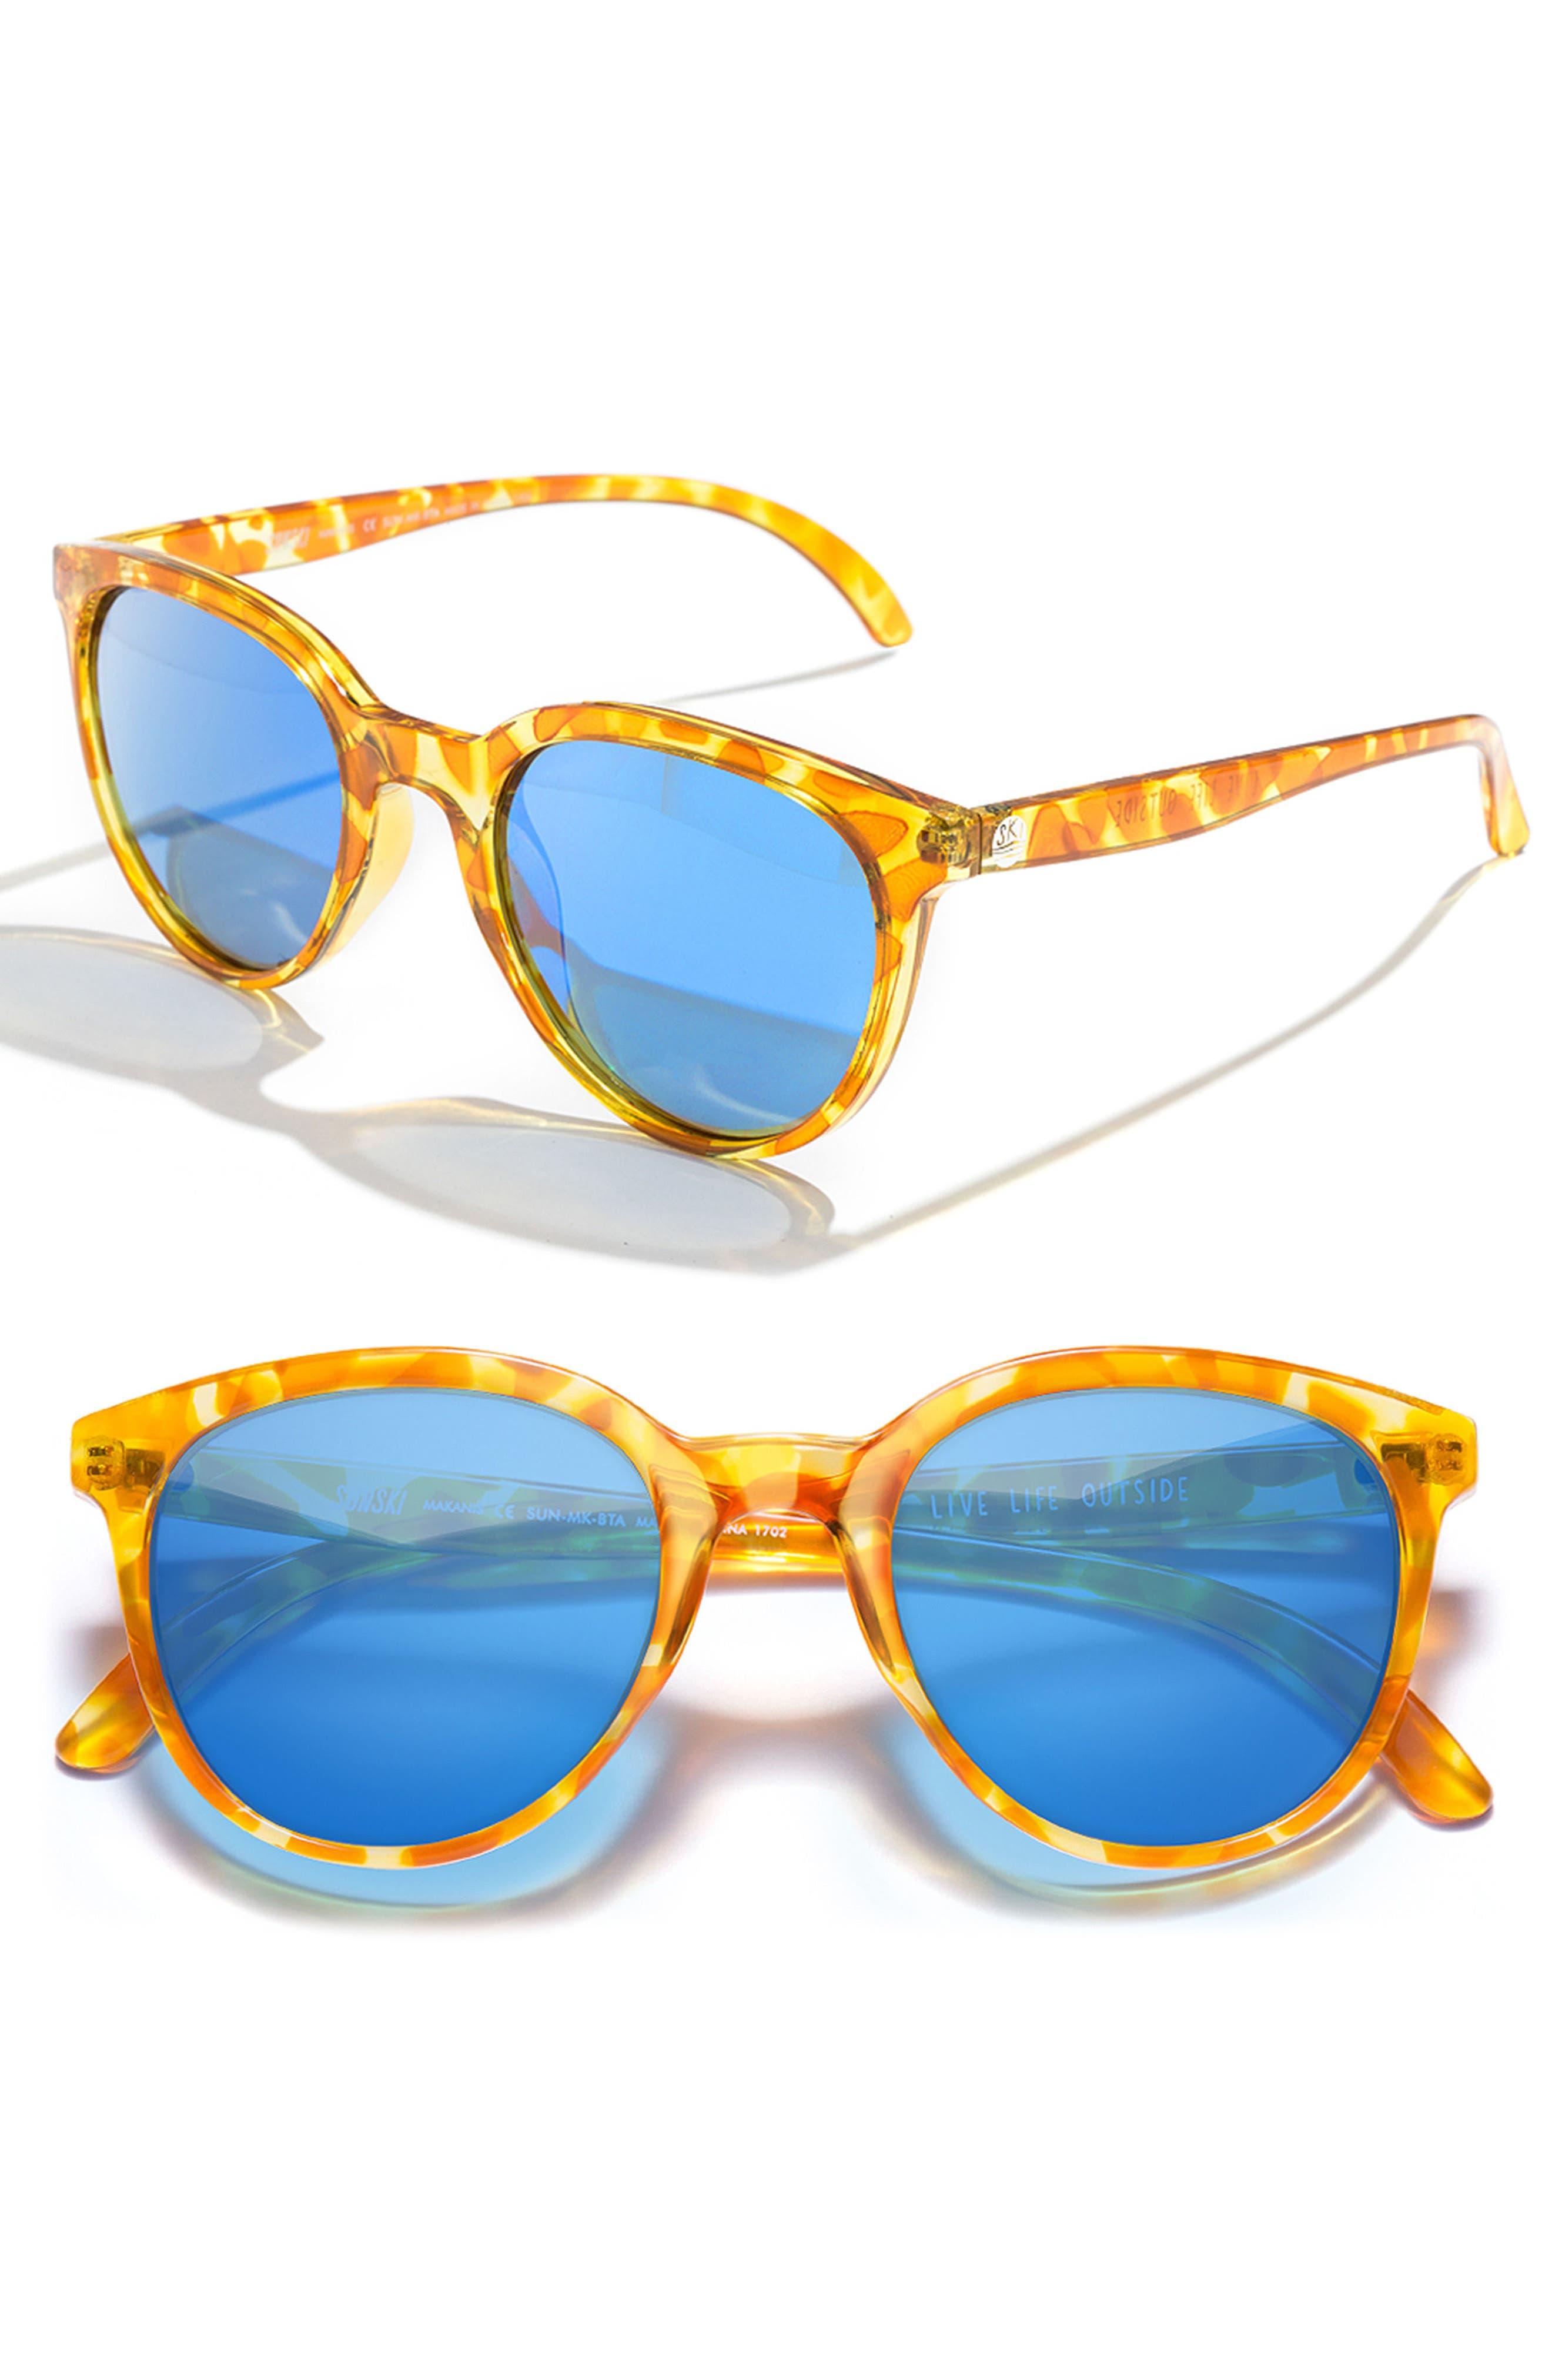 Makani 51mm Mirrored Polarized Sunglasses,                             Main thumbnail 1, color,                             Blond Tortoise/ Aqua